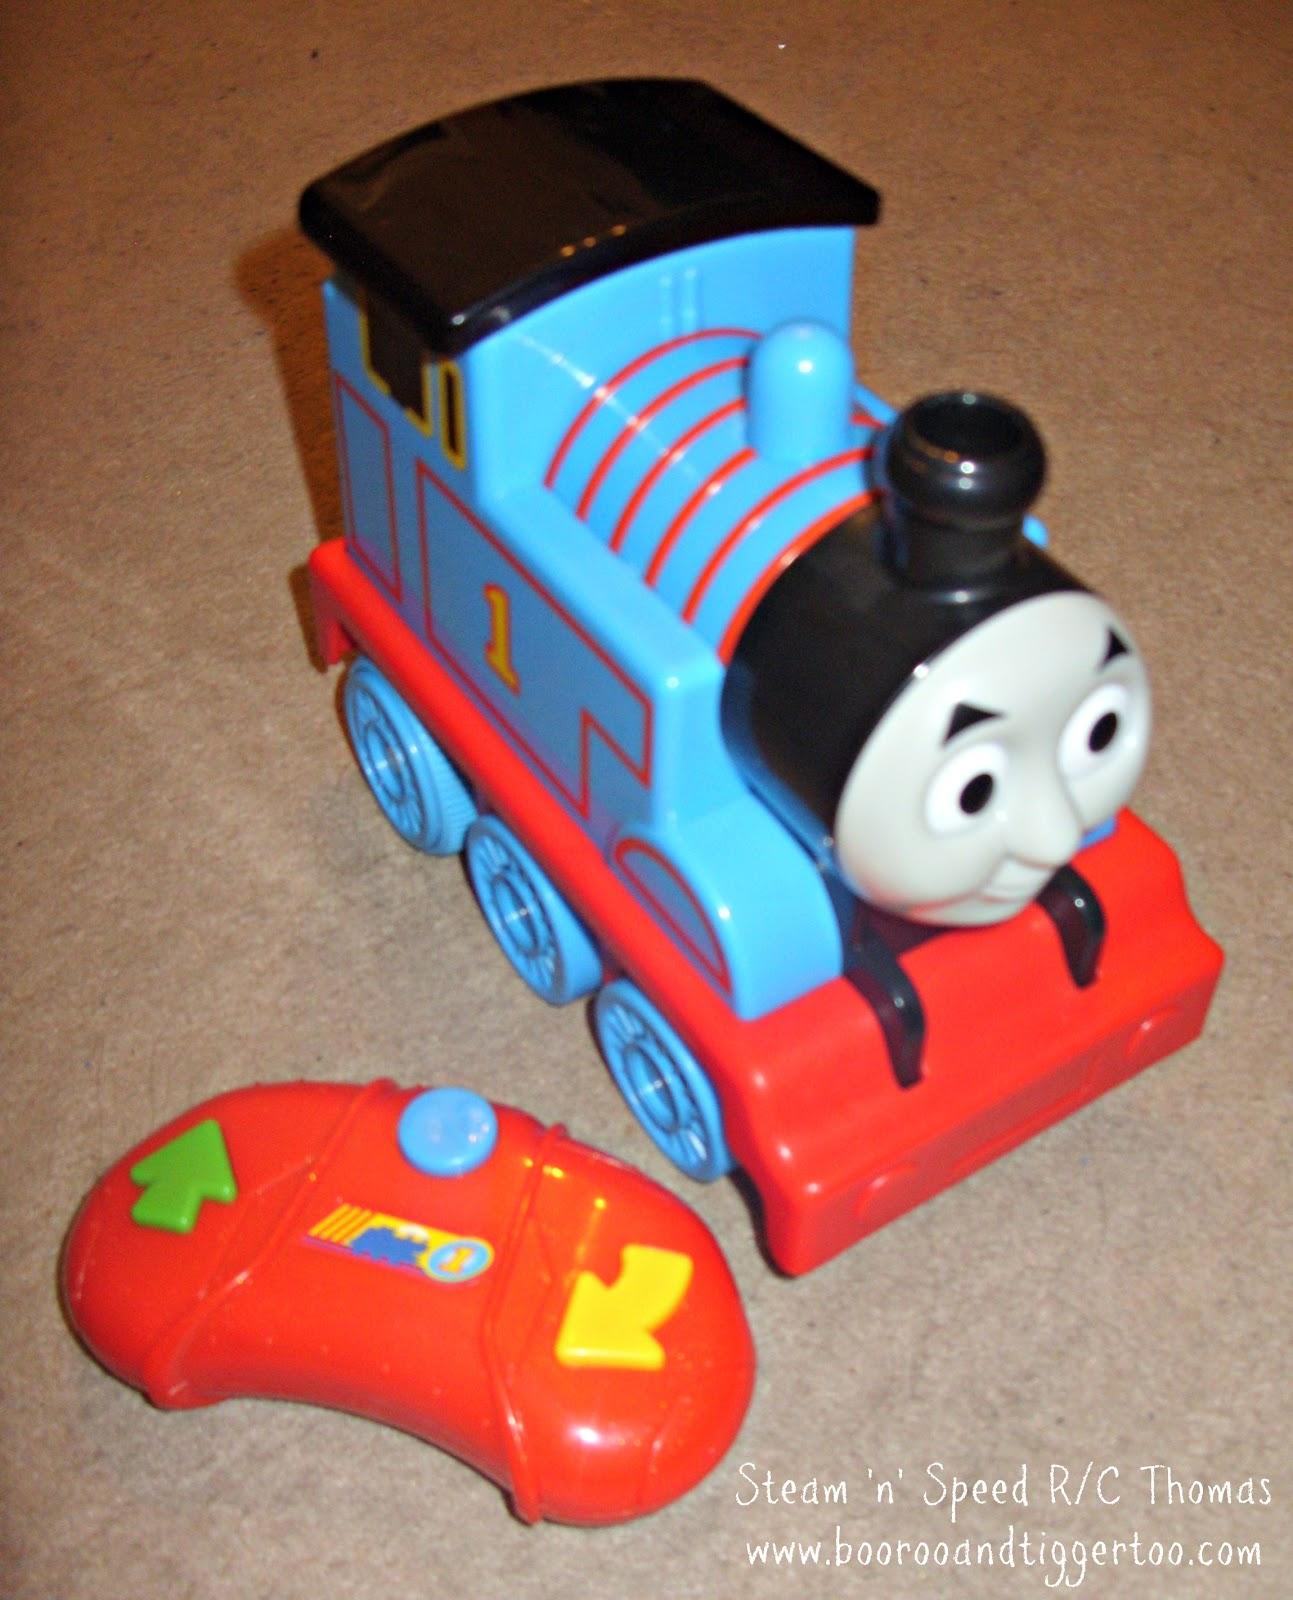 Steam 'n' Speed Radio Control Thomas | Boo Roo and Tigger Too